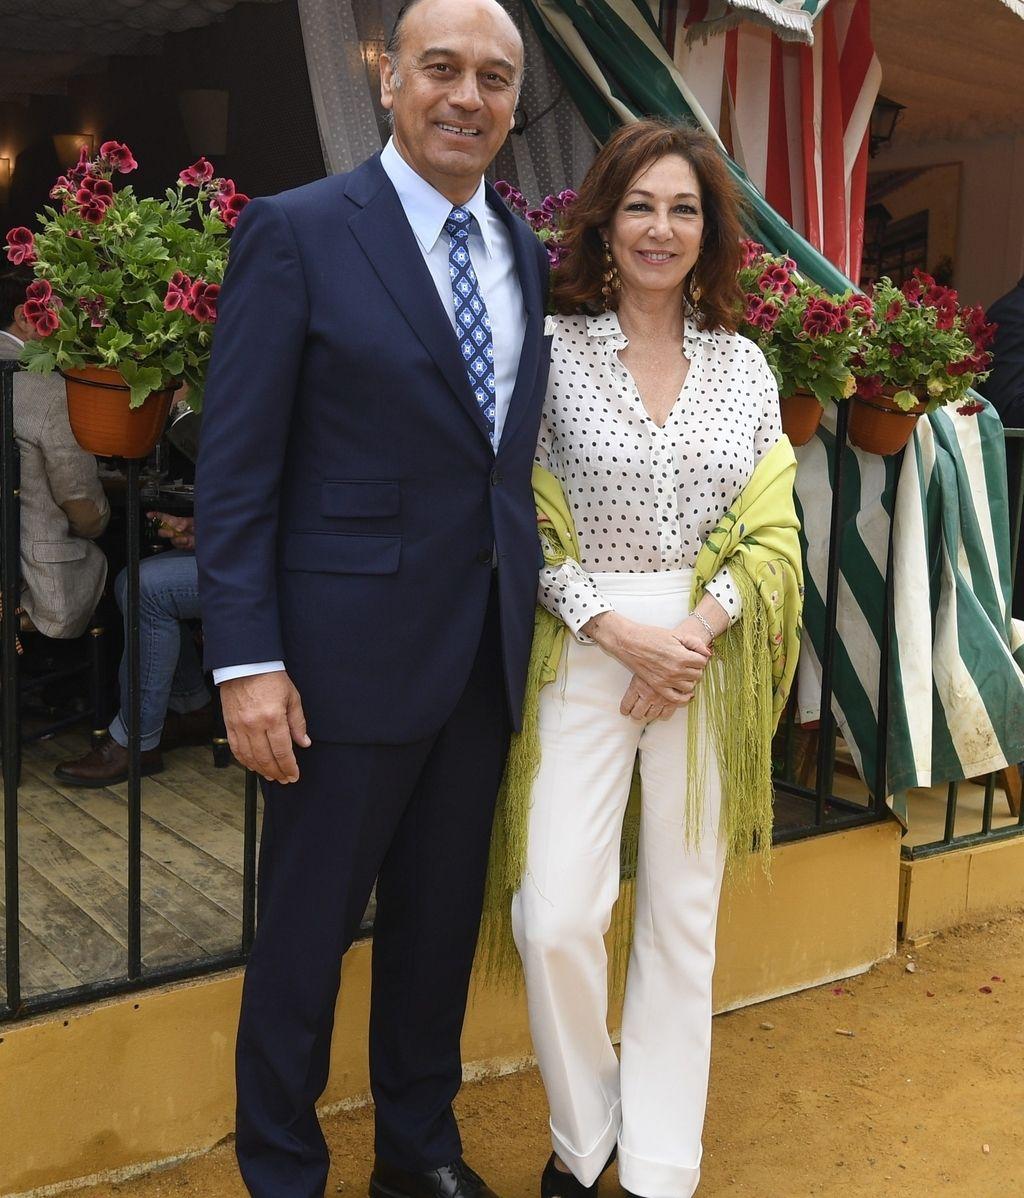 Ana Rosa Quintana, acompañada por su marido Juan, combinó el pantalón